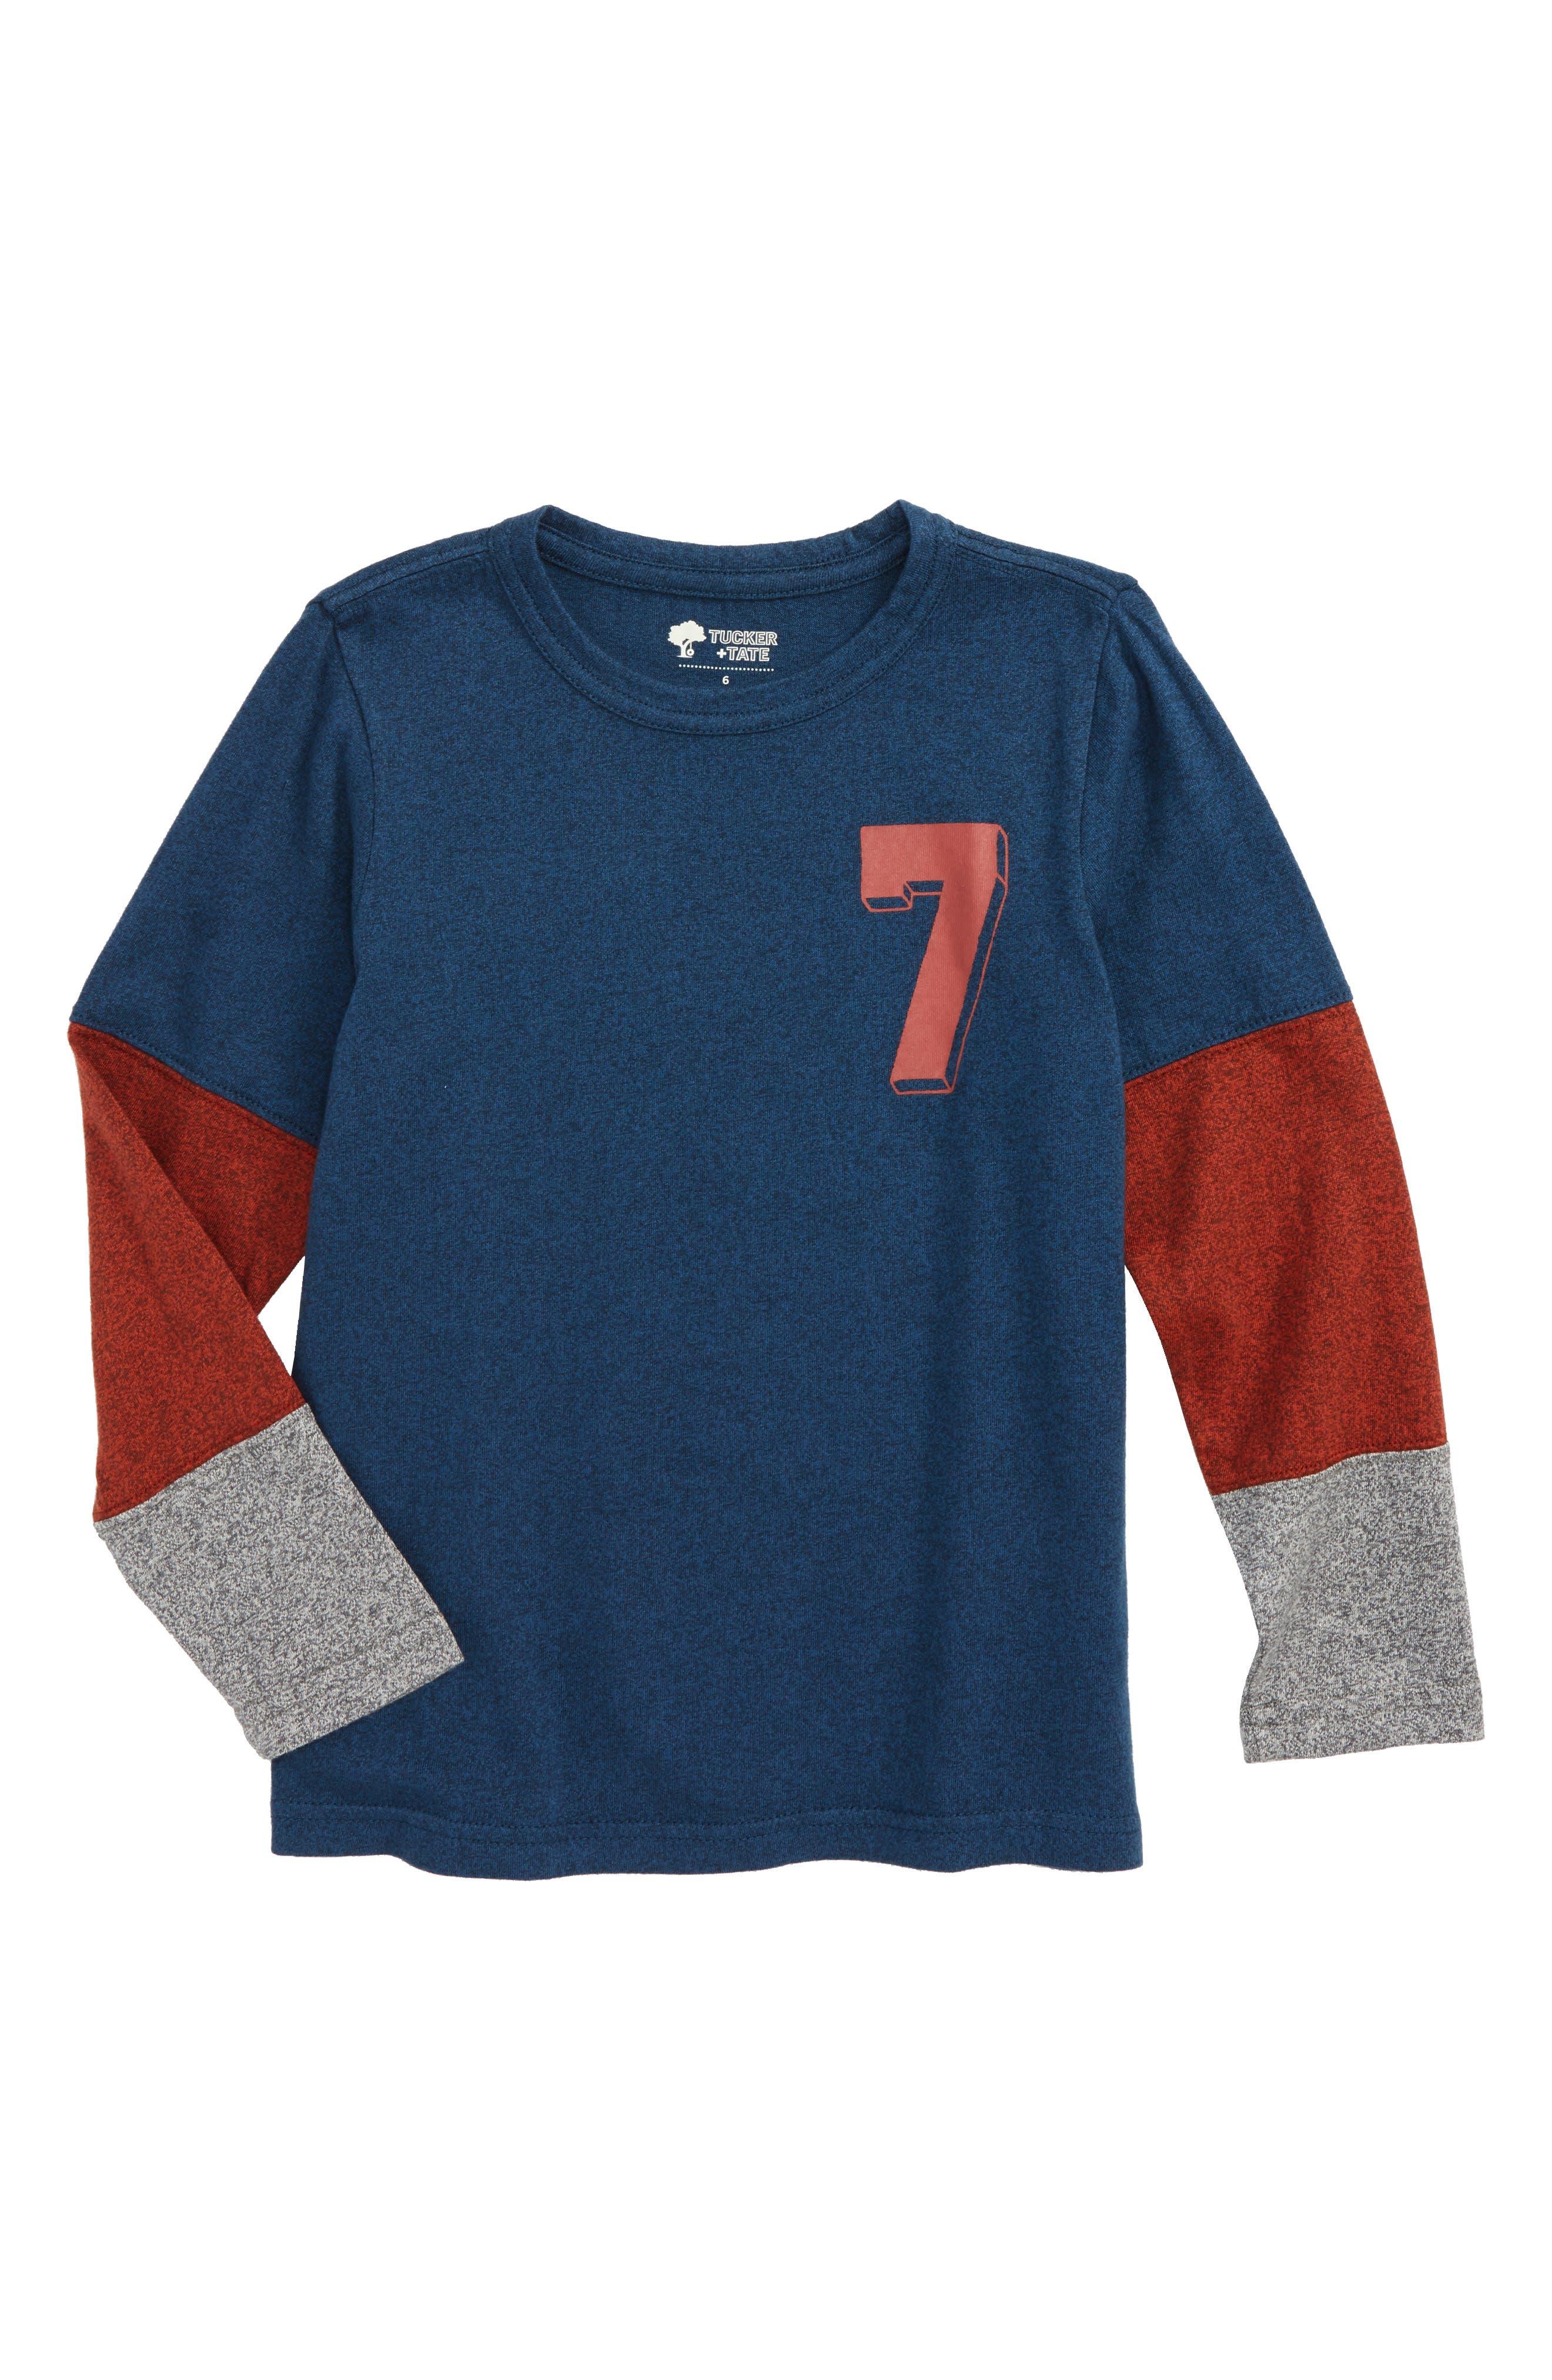 Alternate Image 1 Selected - Tucker + Tate Pieced Sleeve T-Shirt (Toddler Boys & Little Boys)